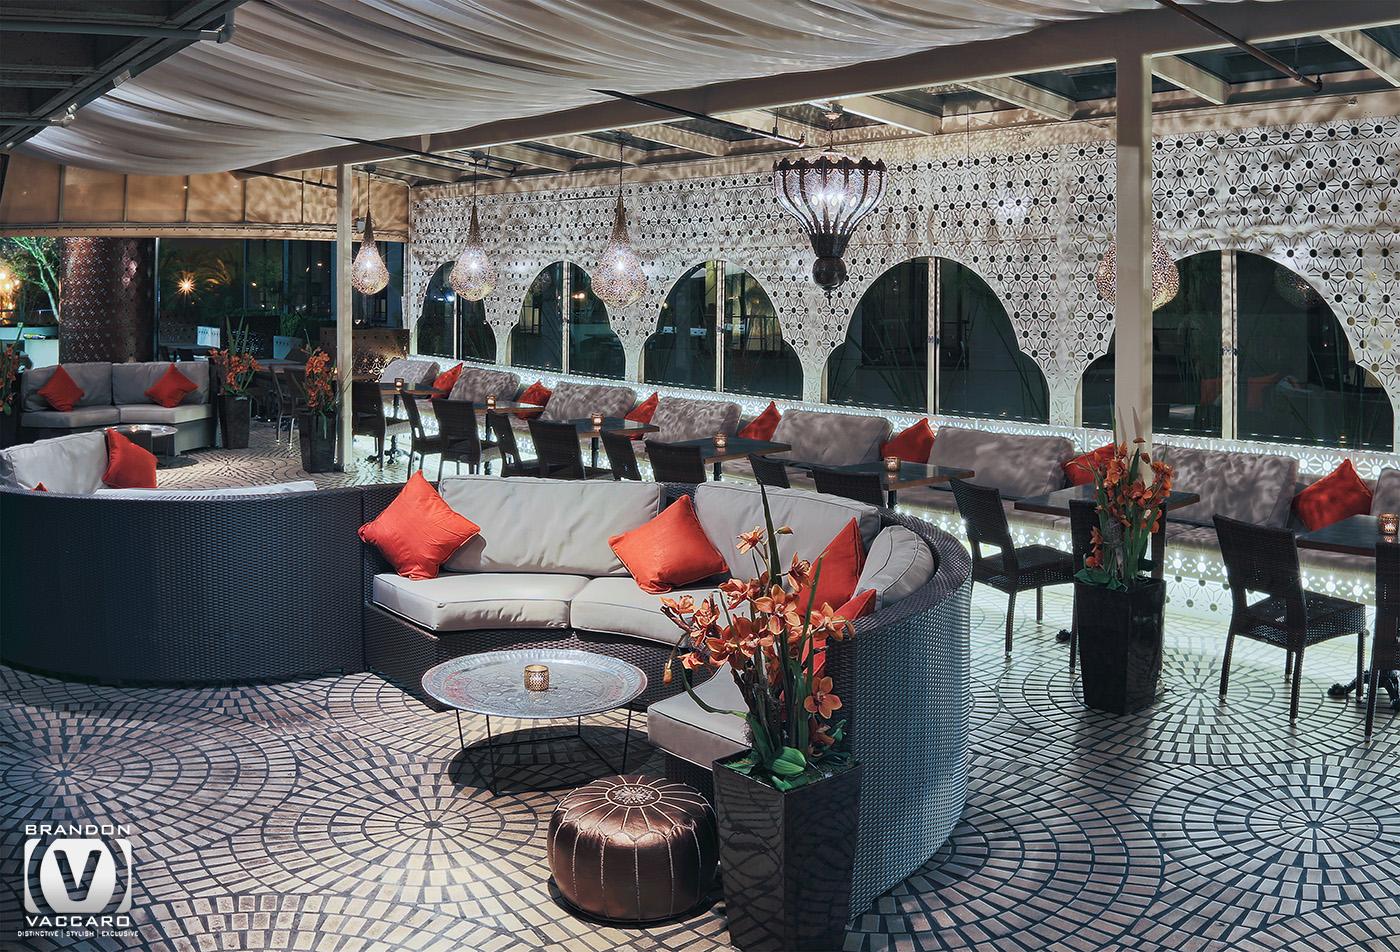 architecture-sens-restaurant-4-embarcadero-center-san-francisco copy.jpg